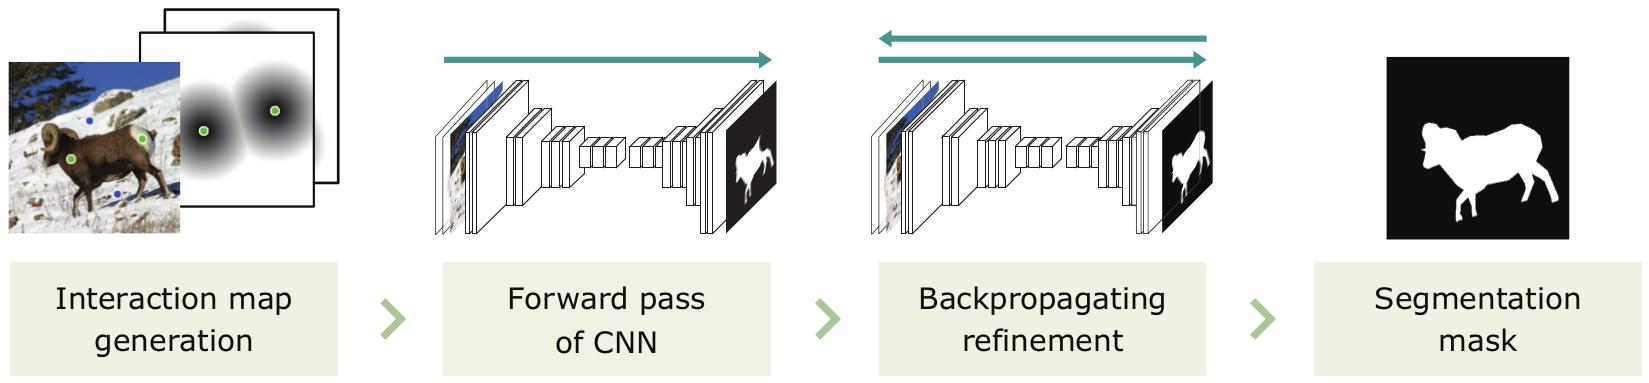 Interactive Image Segmentation via Backpropagating Refinement Scheme